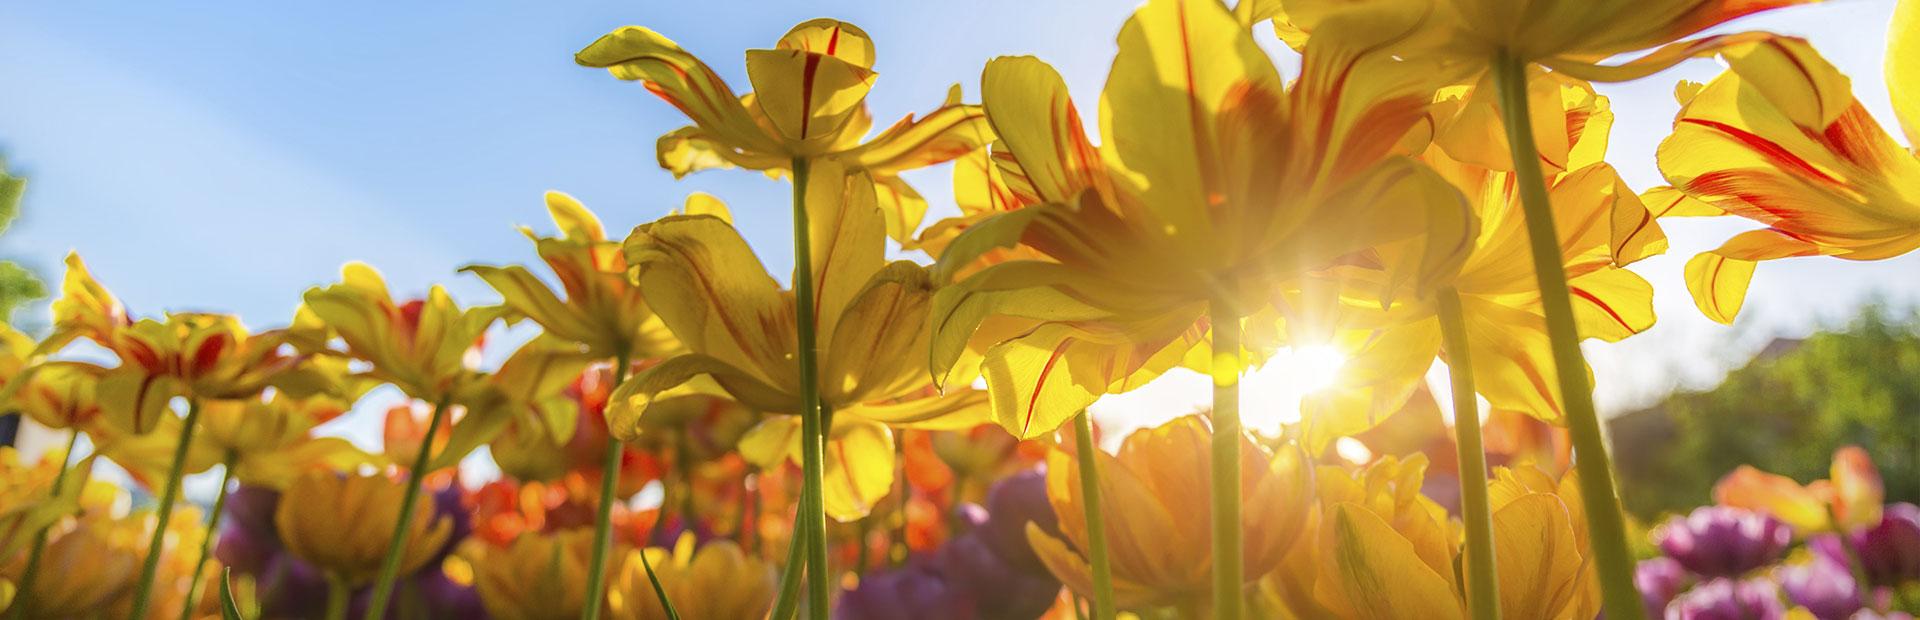 http://derstinelandscaping.com/wp-content/uploads/2019/08/tulips-slider.jpg